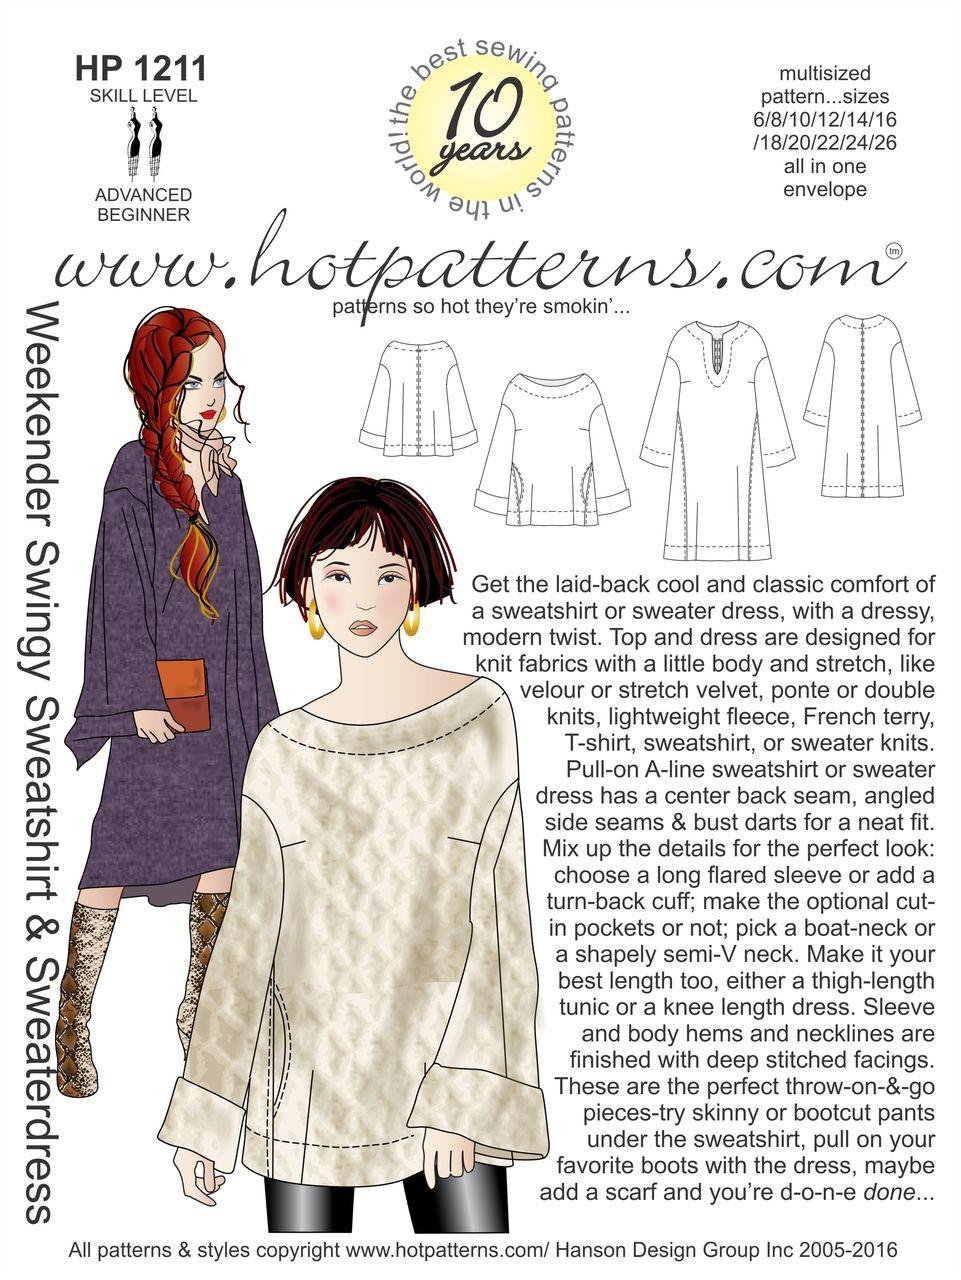 91d0b3c7407 HP 1211 A4 download Weekender Swingy Sweatshirt   Sweaterdress -  HotPatterns.com